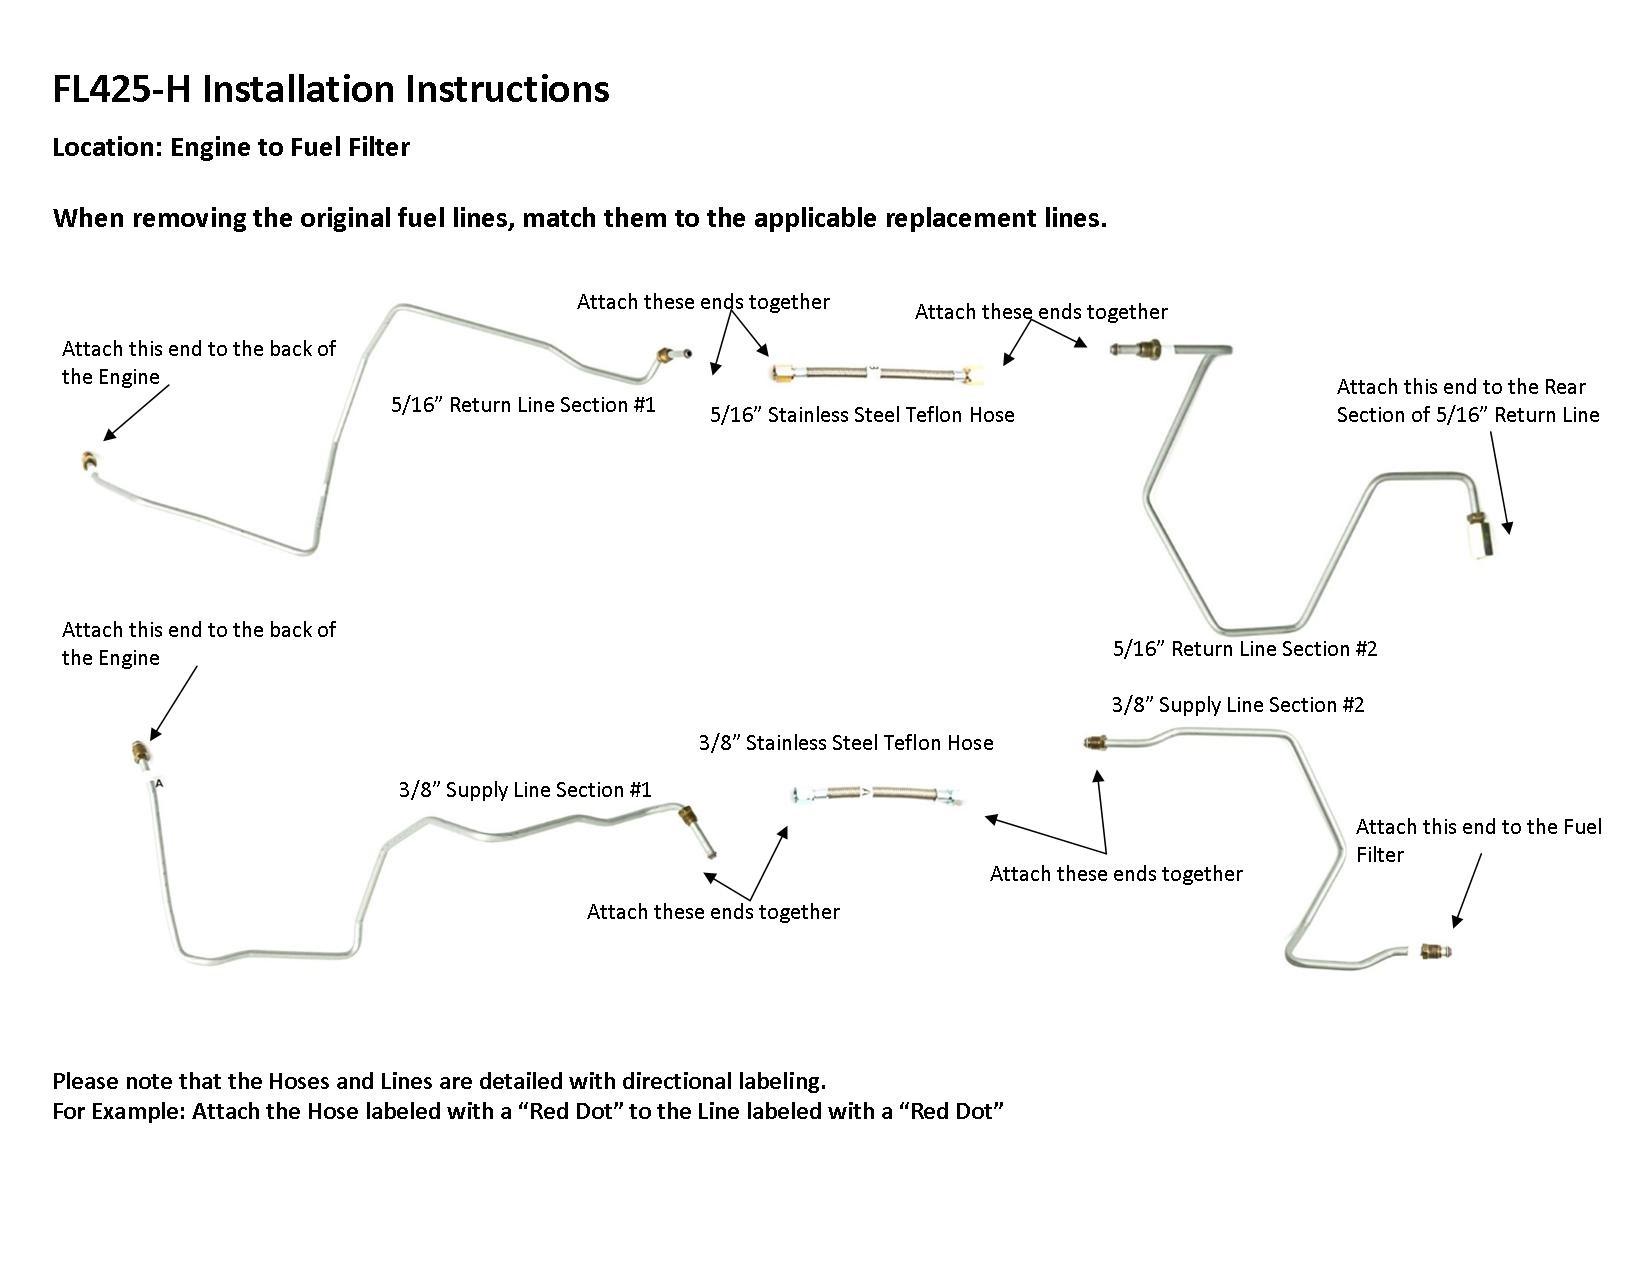 1995-s10-sonoma-installation-instruction-fl425-h.jpg